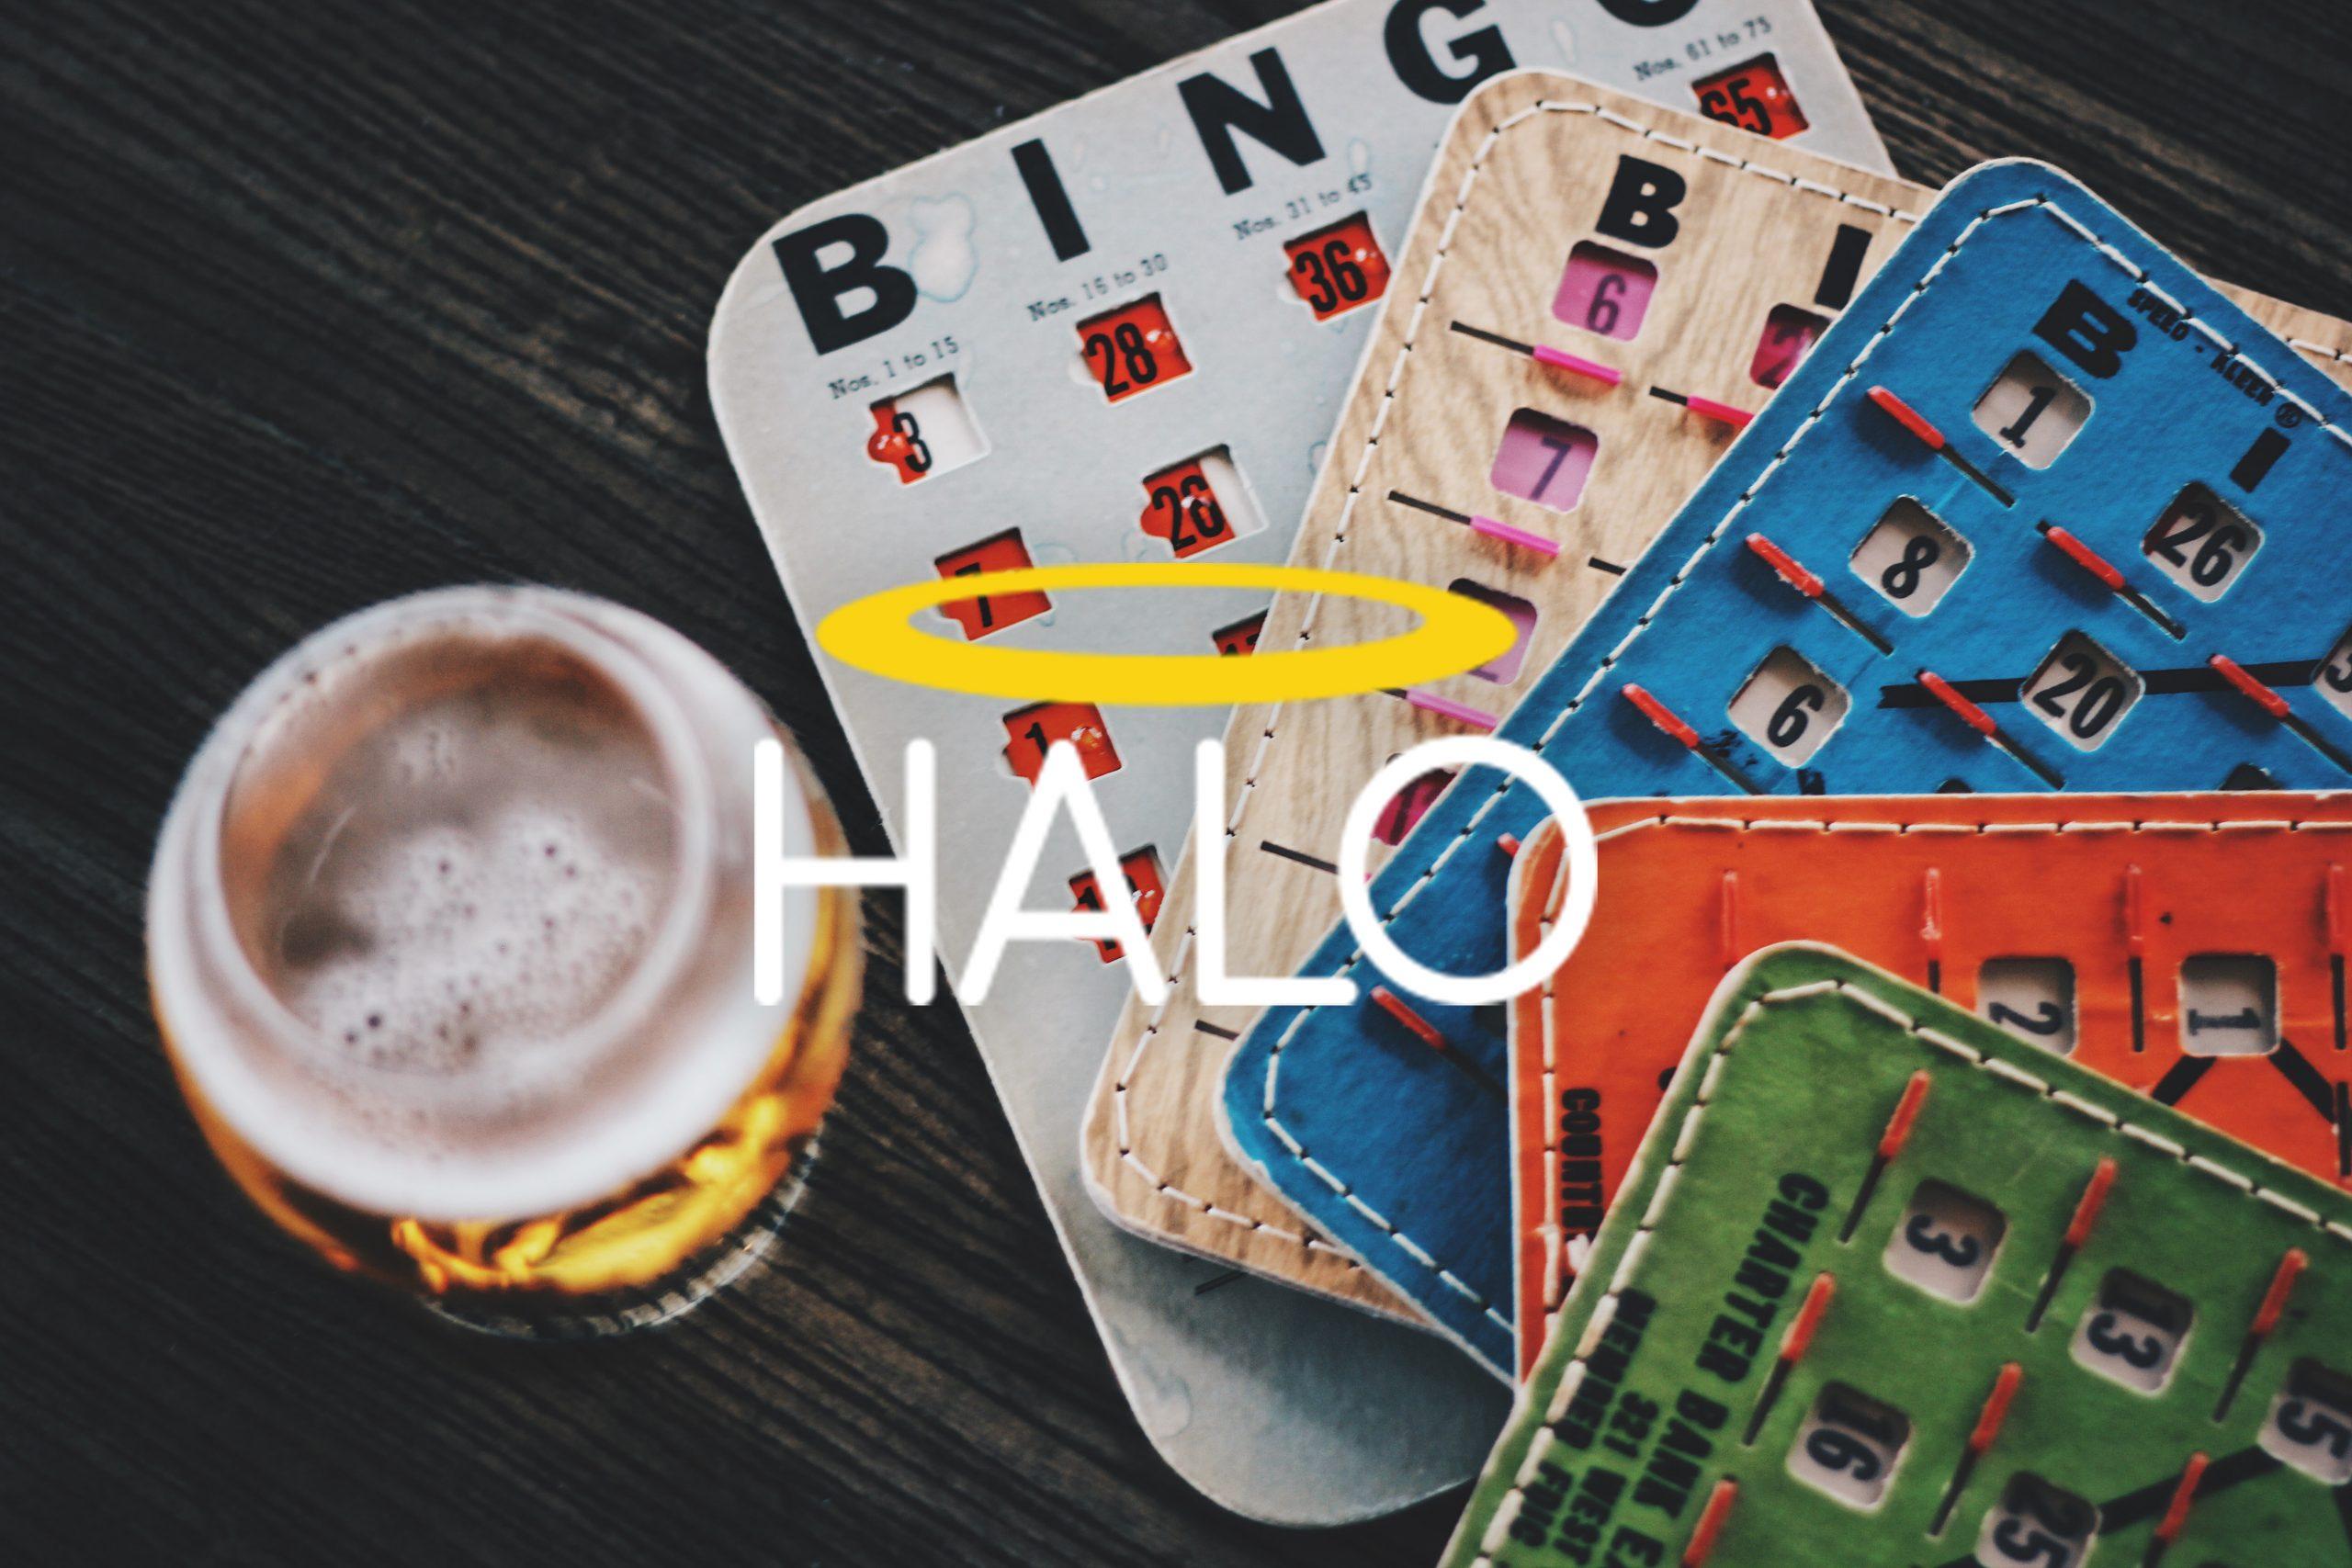 Boulevard Tours & Rec Bingo with Halo